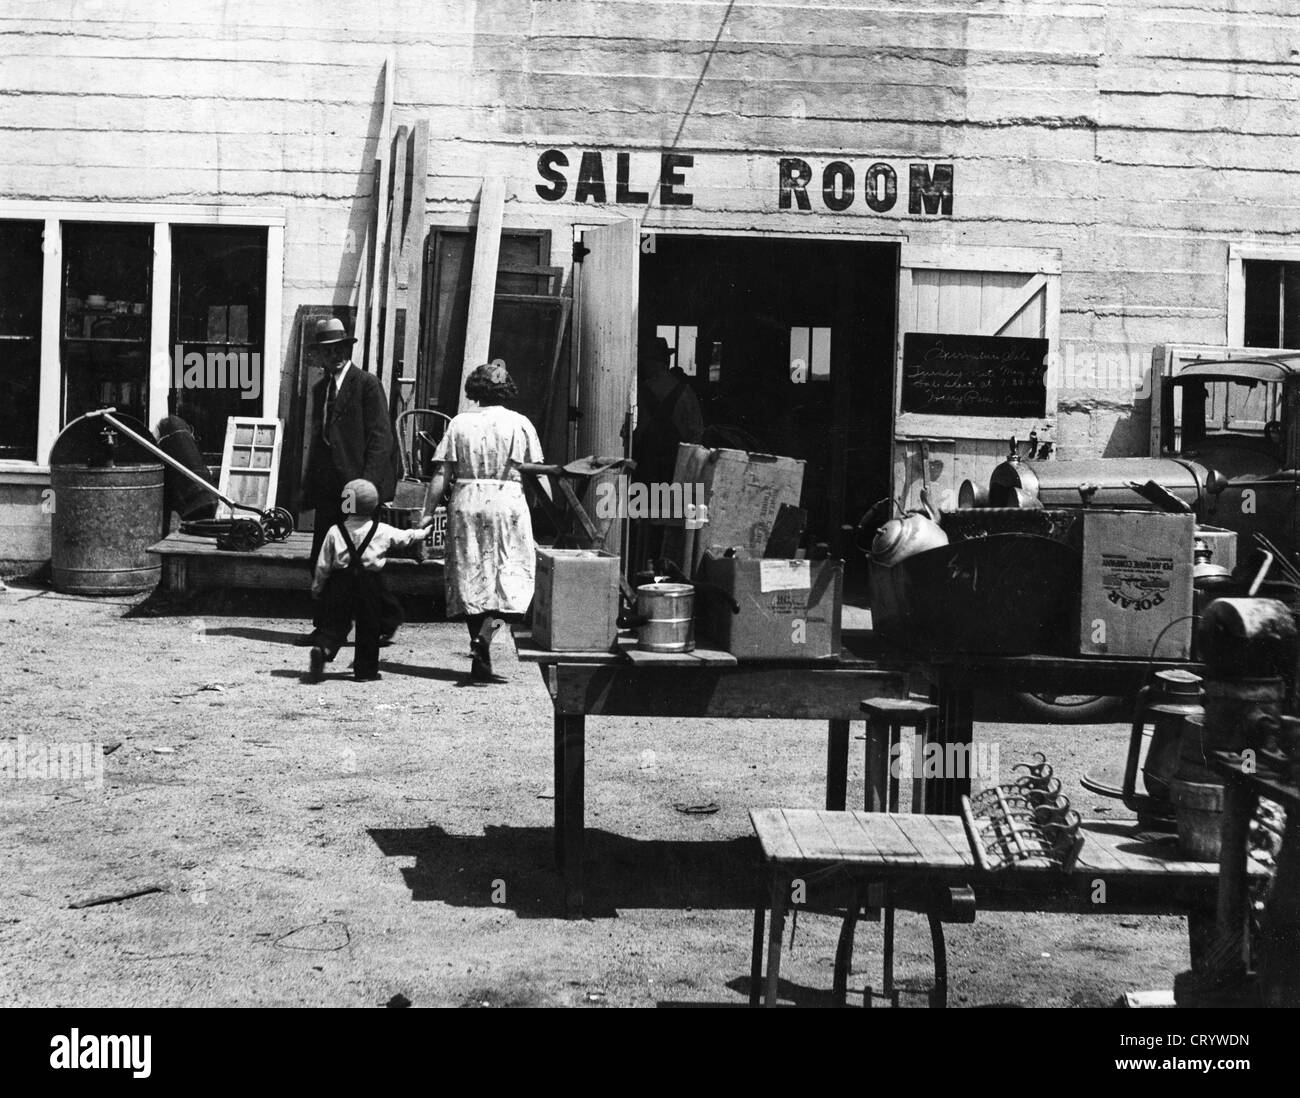 Household 1930s Stockfotos & Household 1930s Bilder - Seite 2 - Alamy